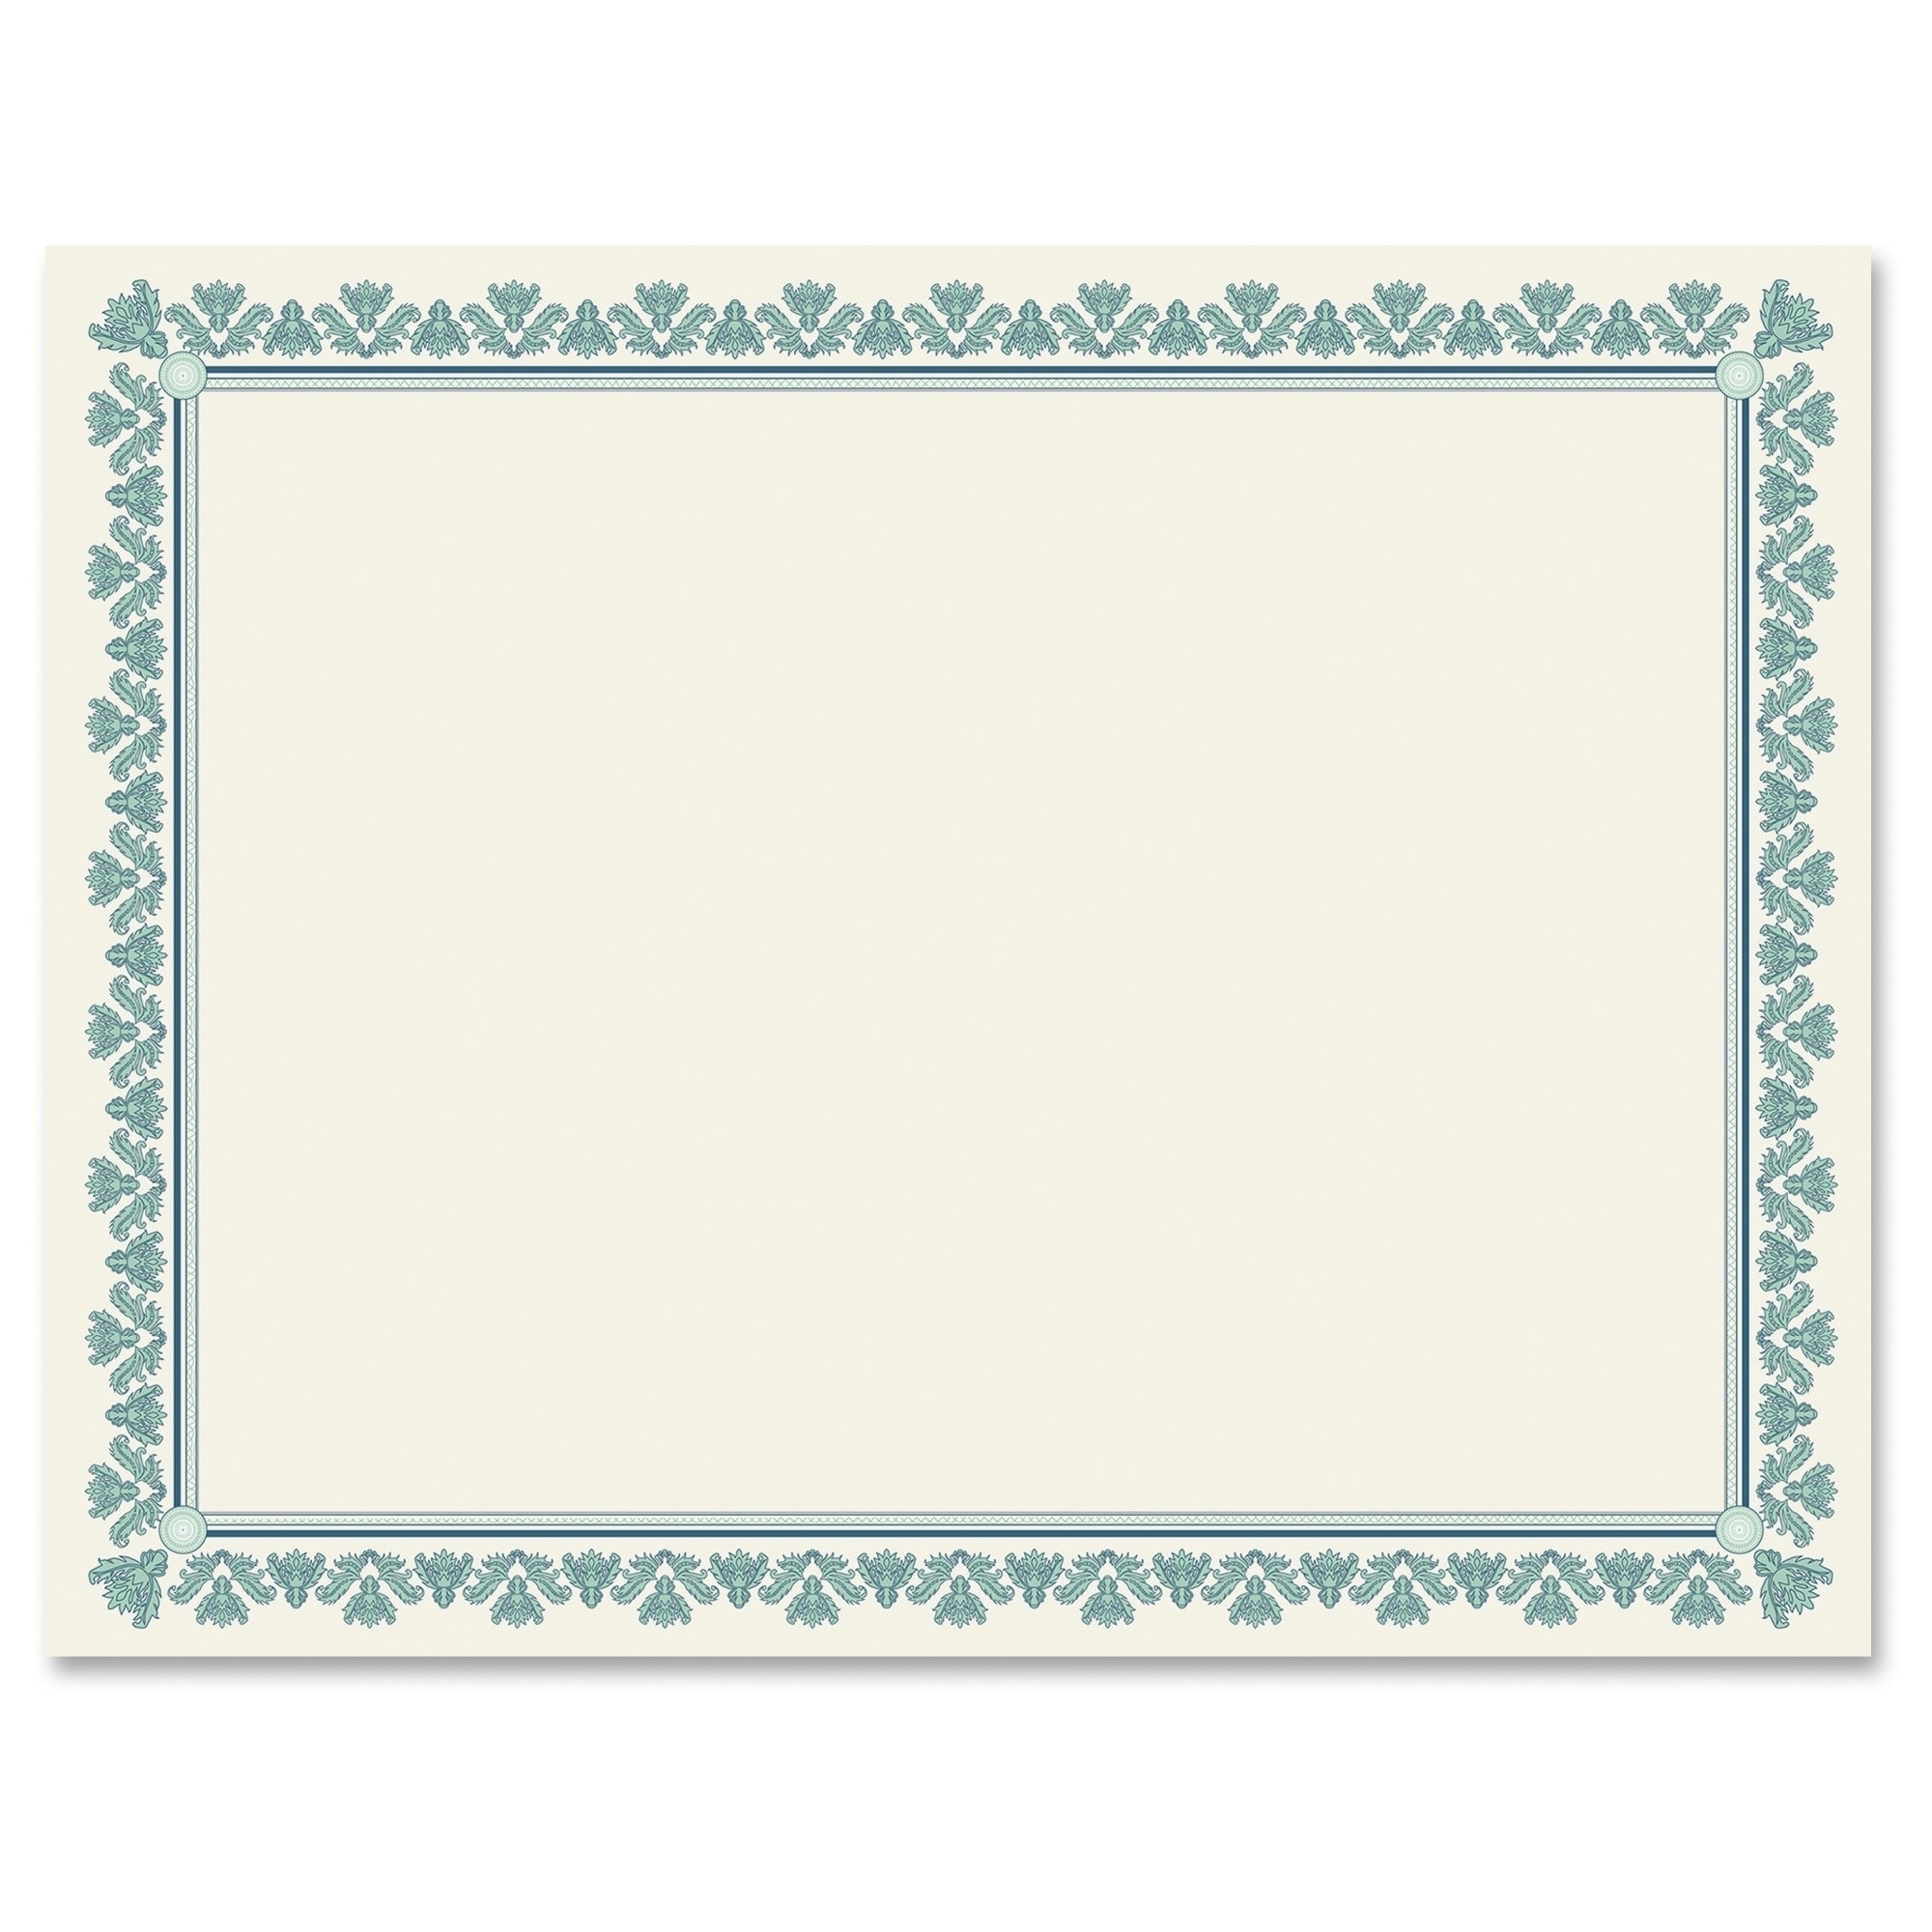 Geographics Fleur Border Blank Certificates - Aquamarine ...